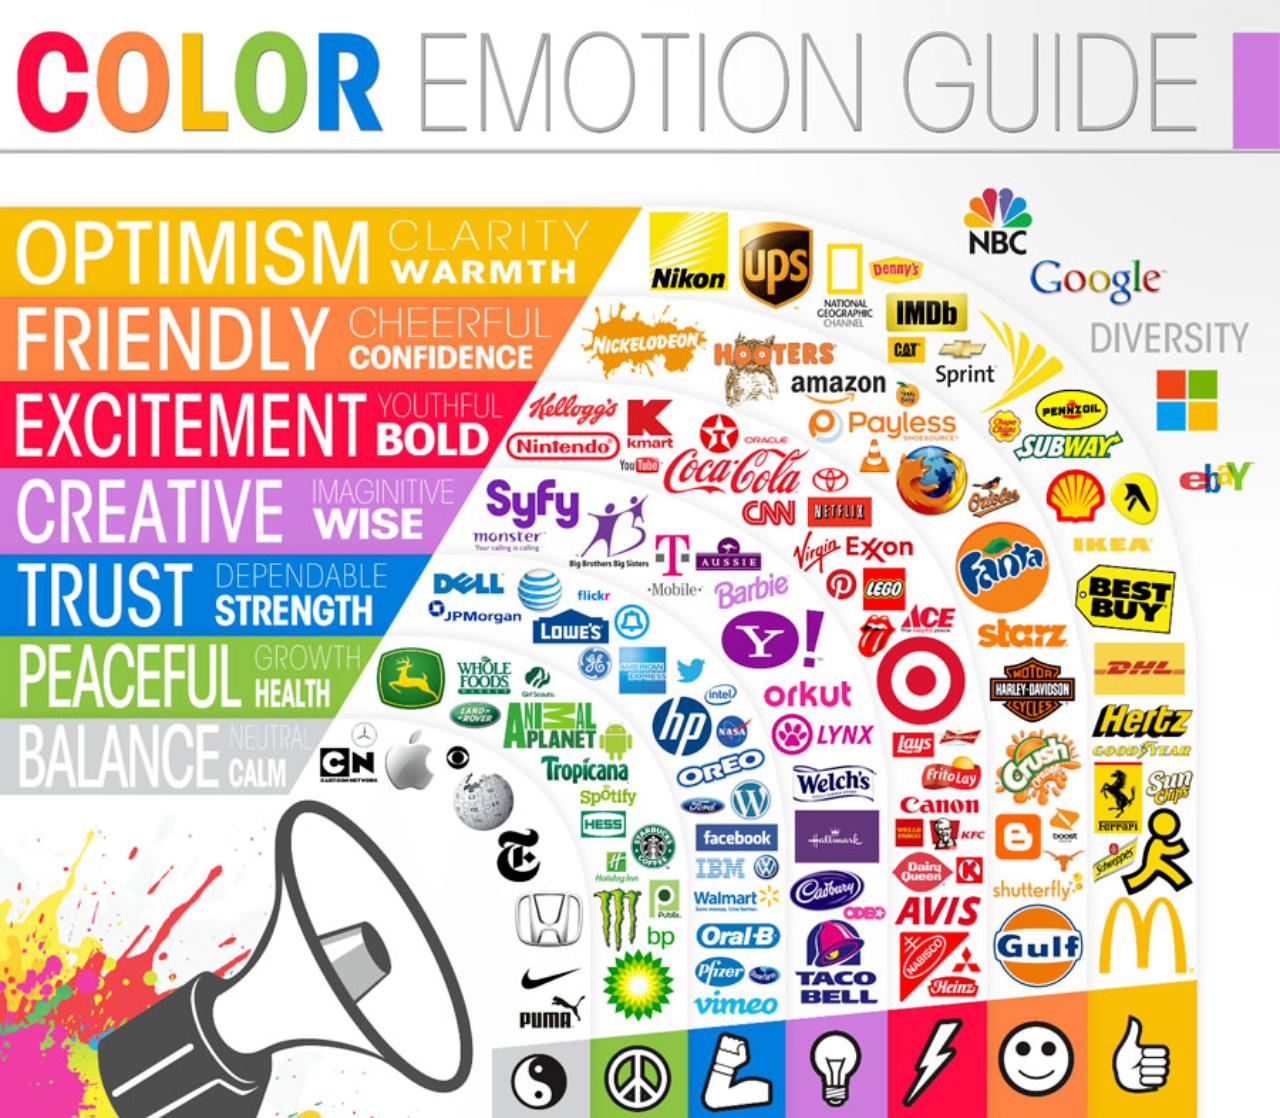 Color emotion quide